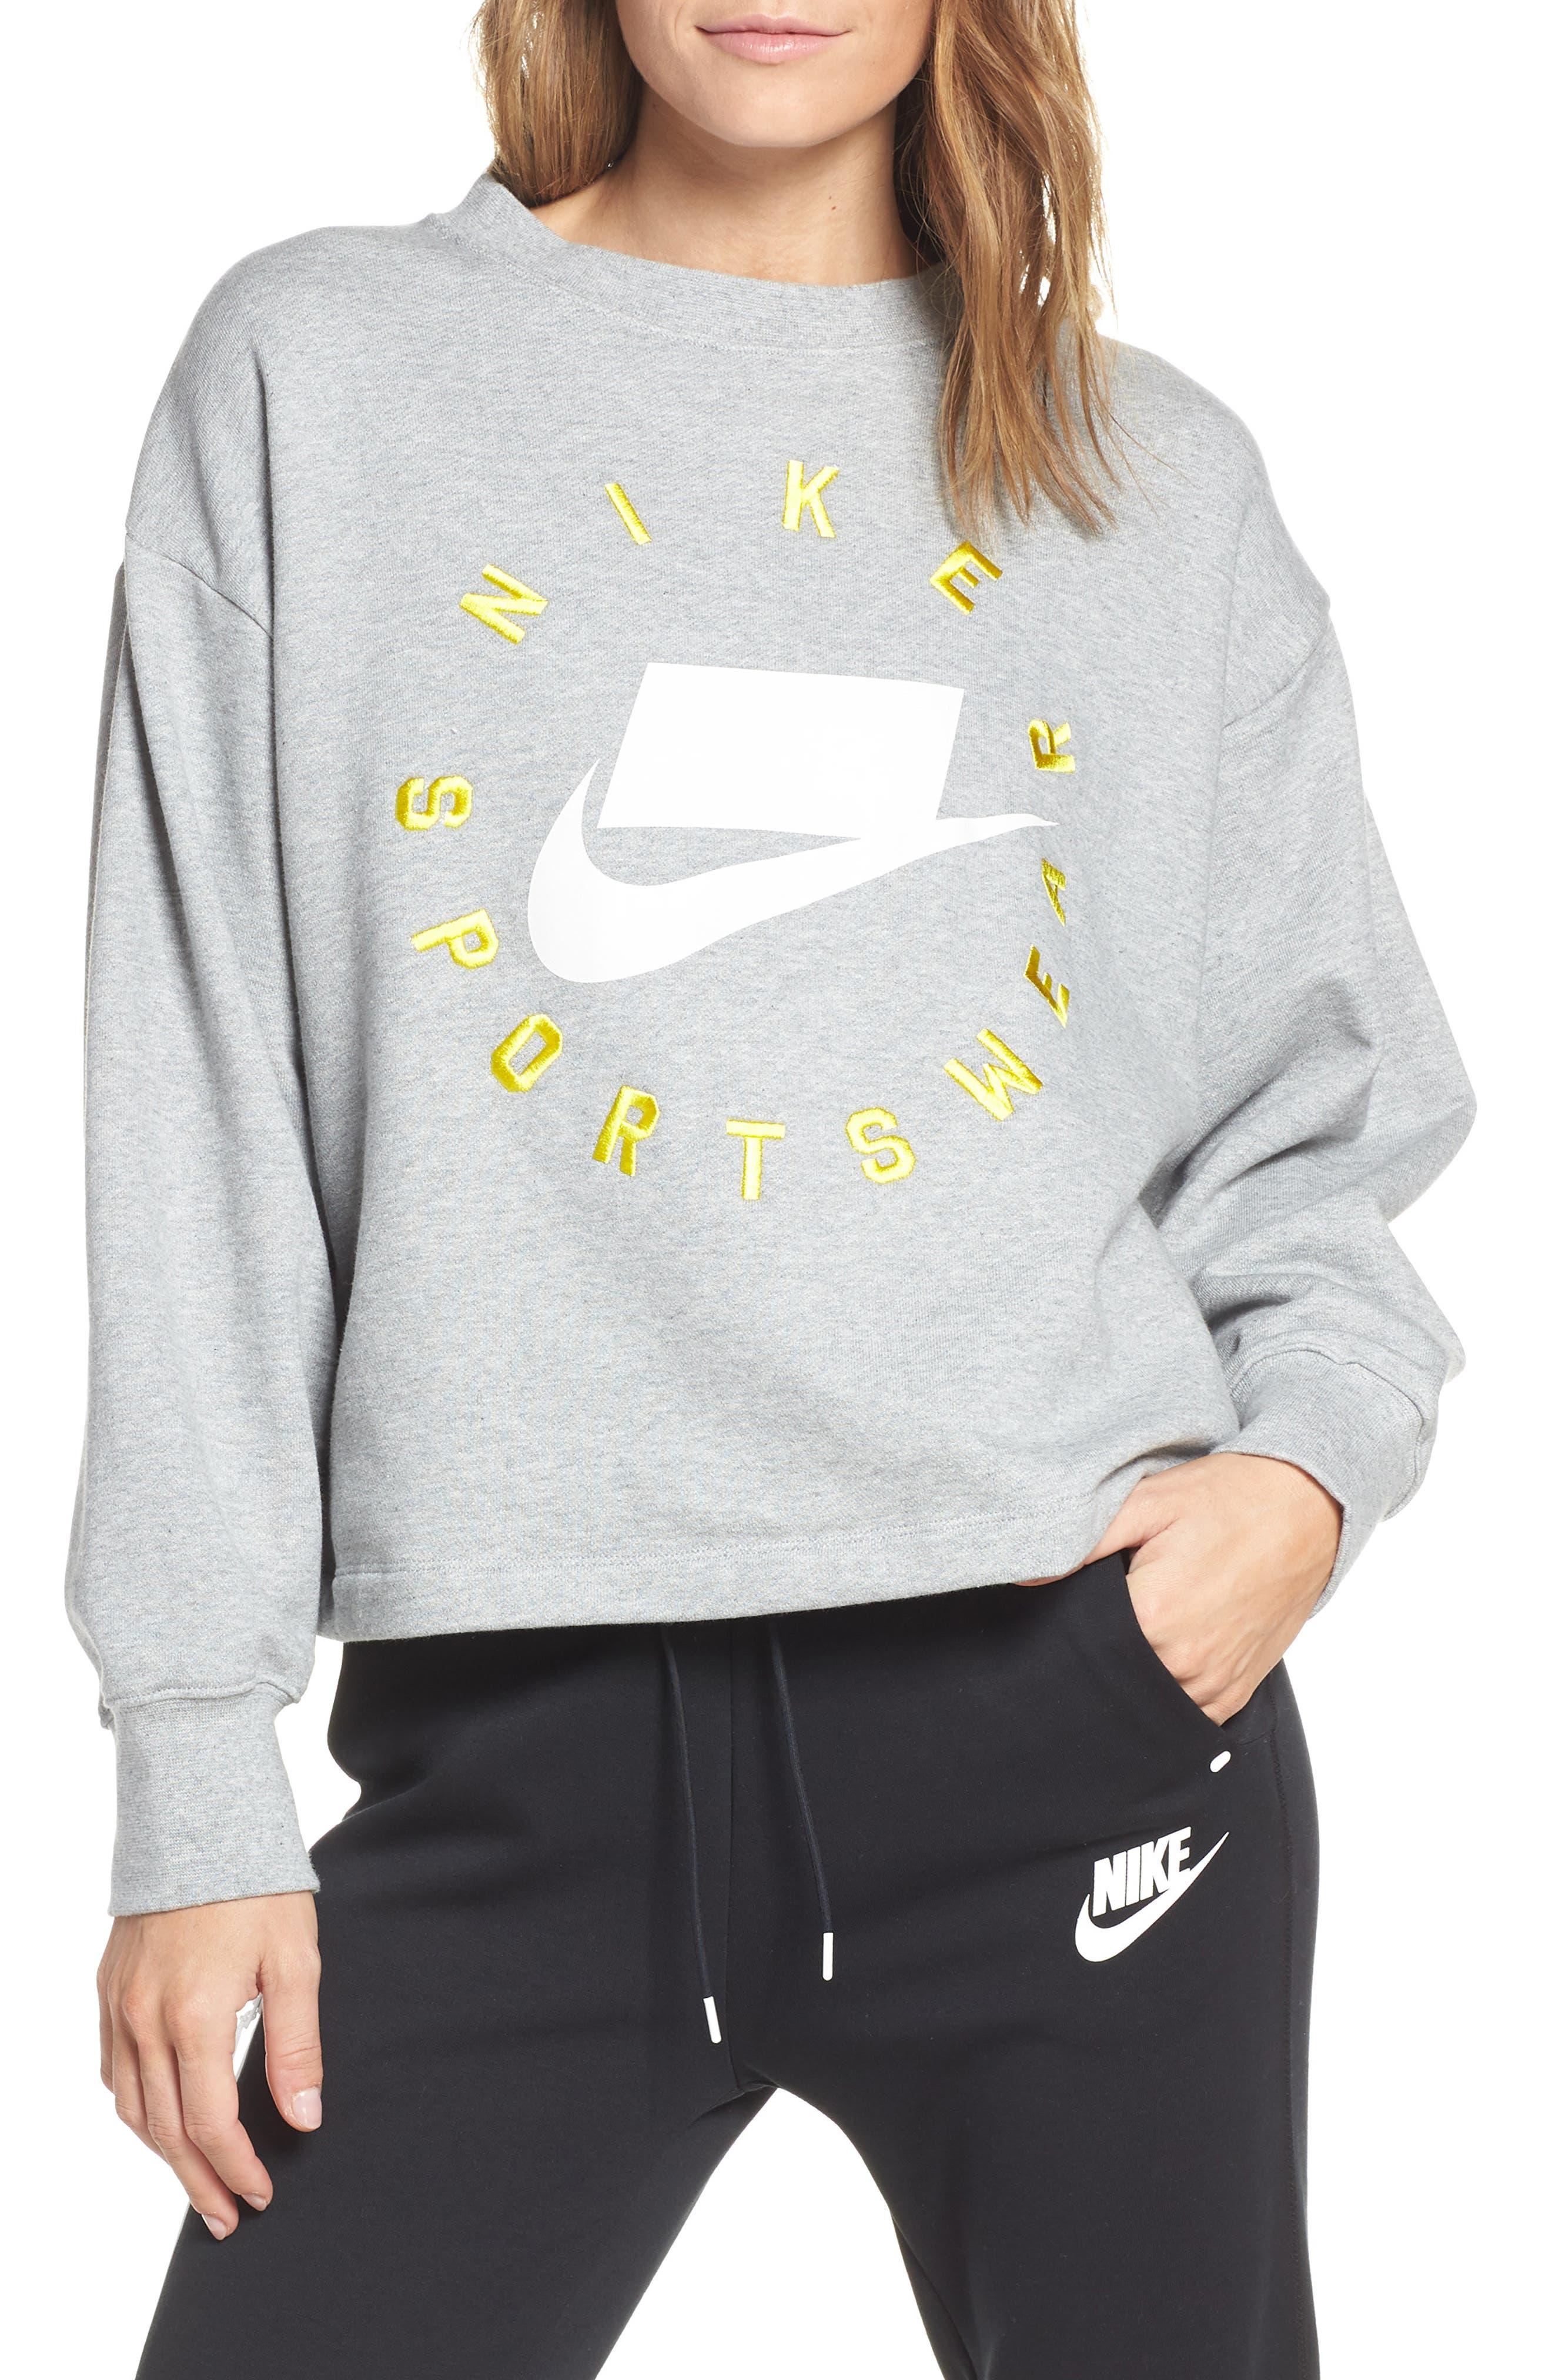 NIKE, Sportswear Logo Oversize Sweatshirt, Main thumbnail 1, color, DARK GREY HEATHER